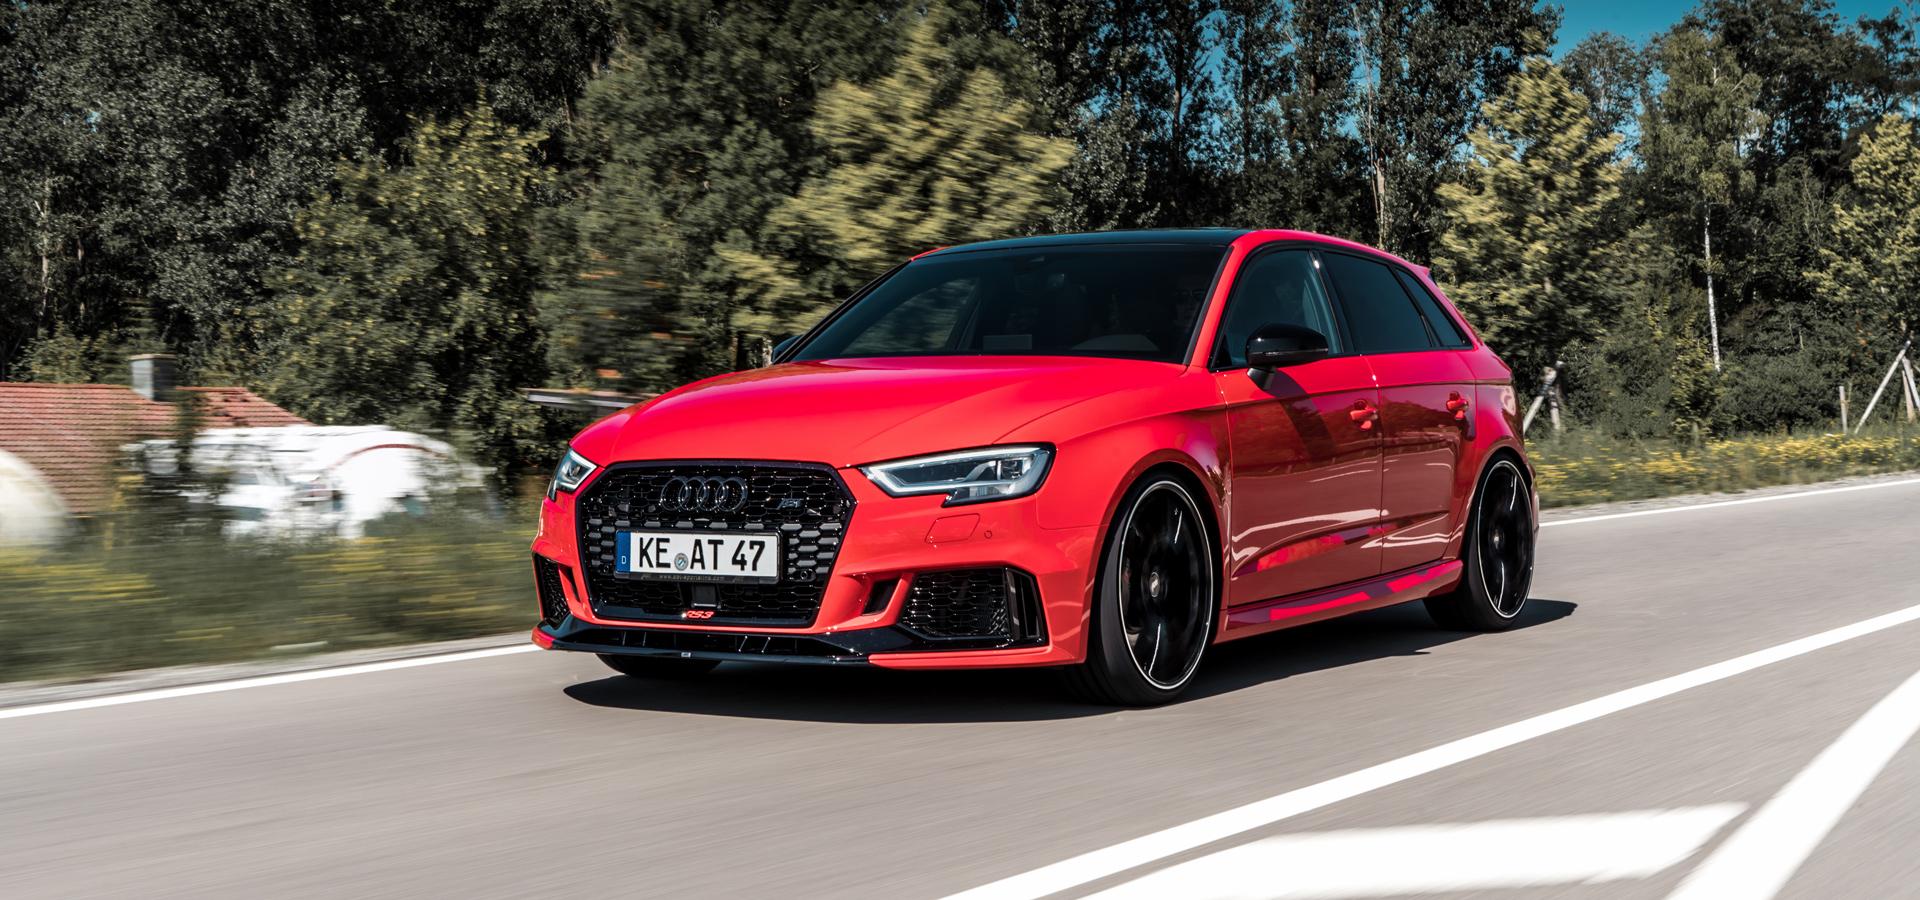 Tuning ABT Sportsline - Audi tuning